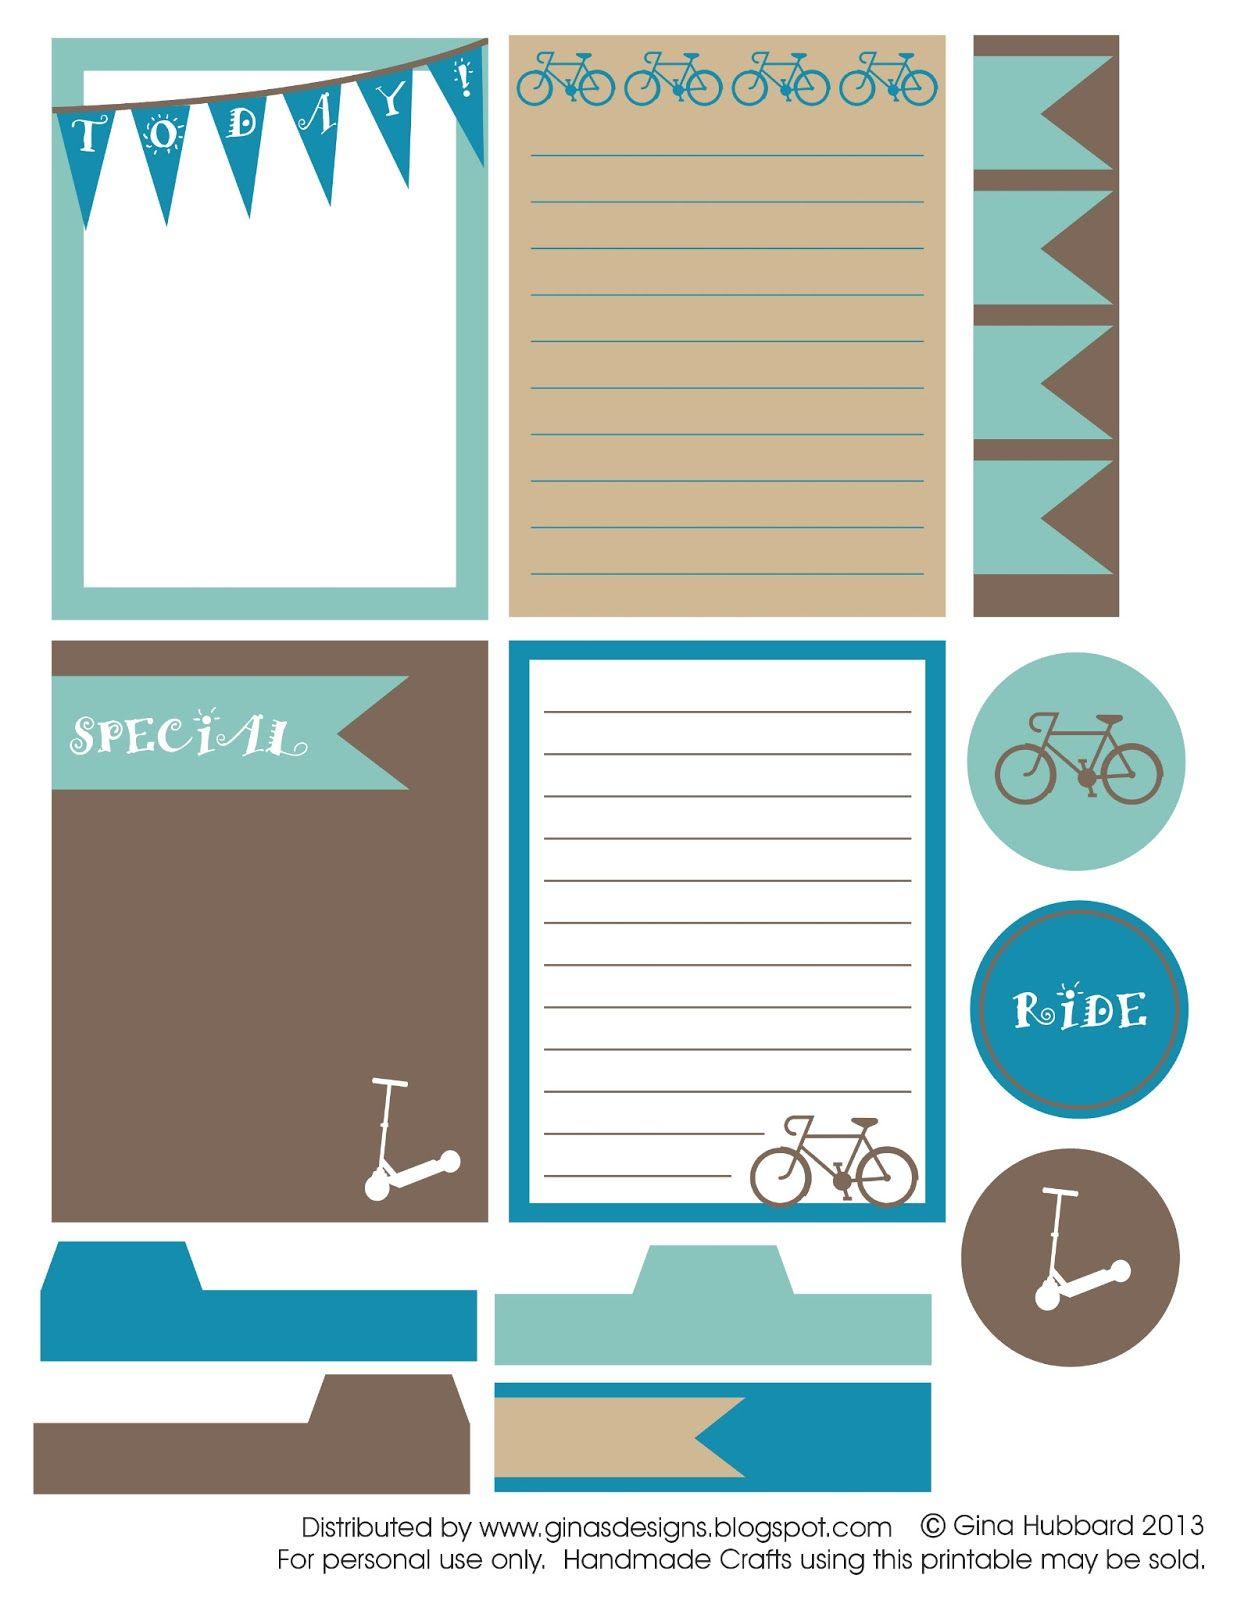 Pin de estefania ochoa en plantillas | Pinterest | Etiquetas ...